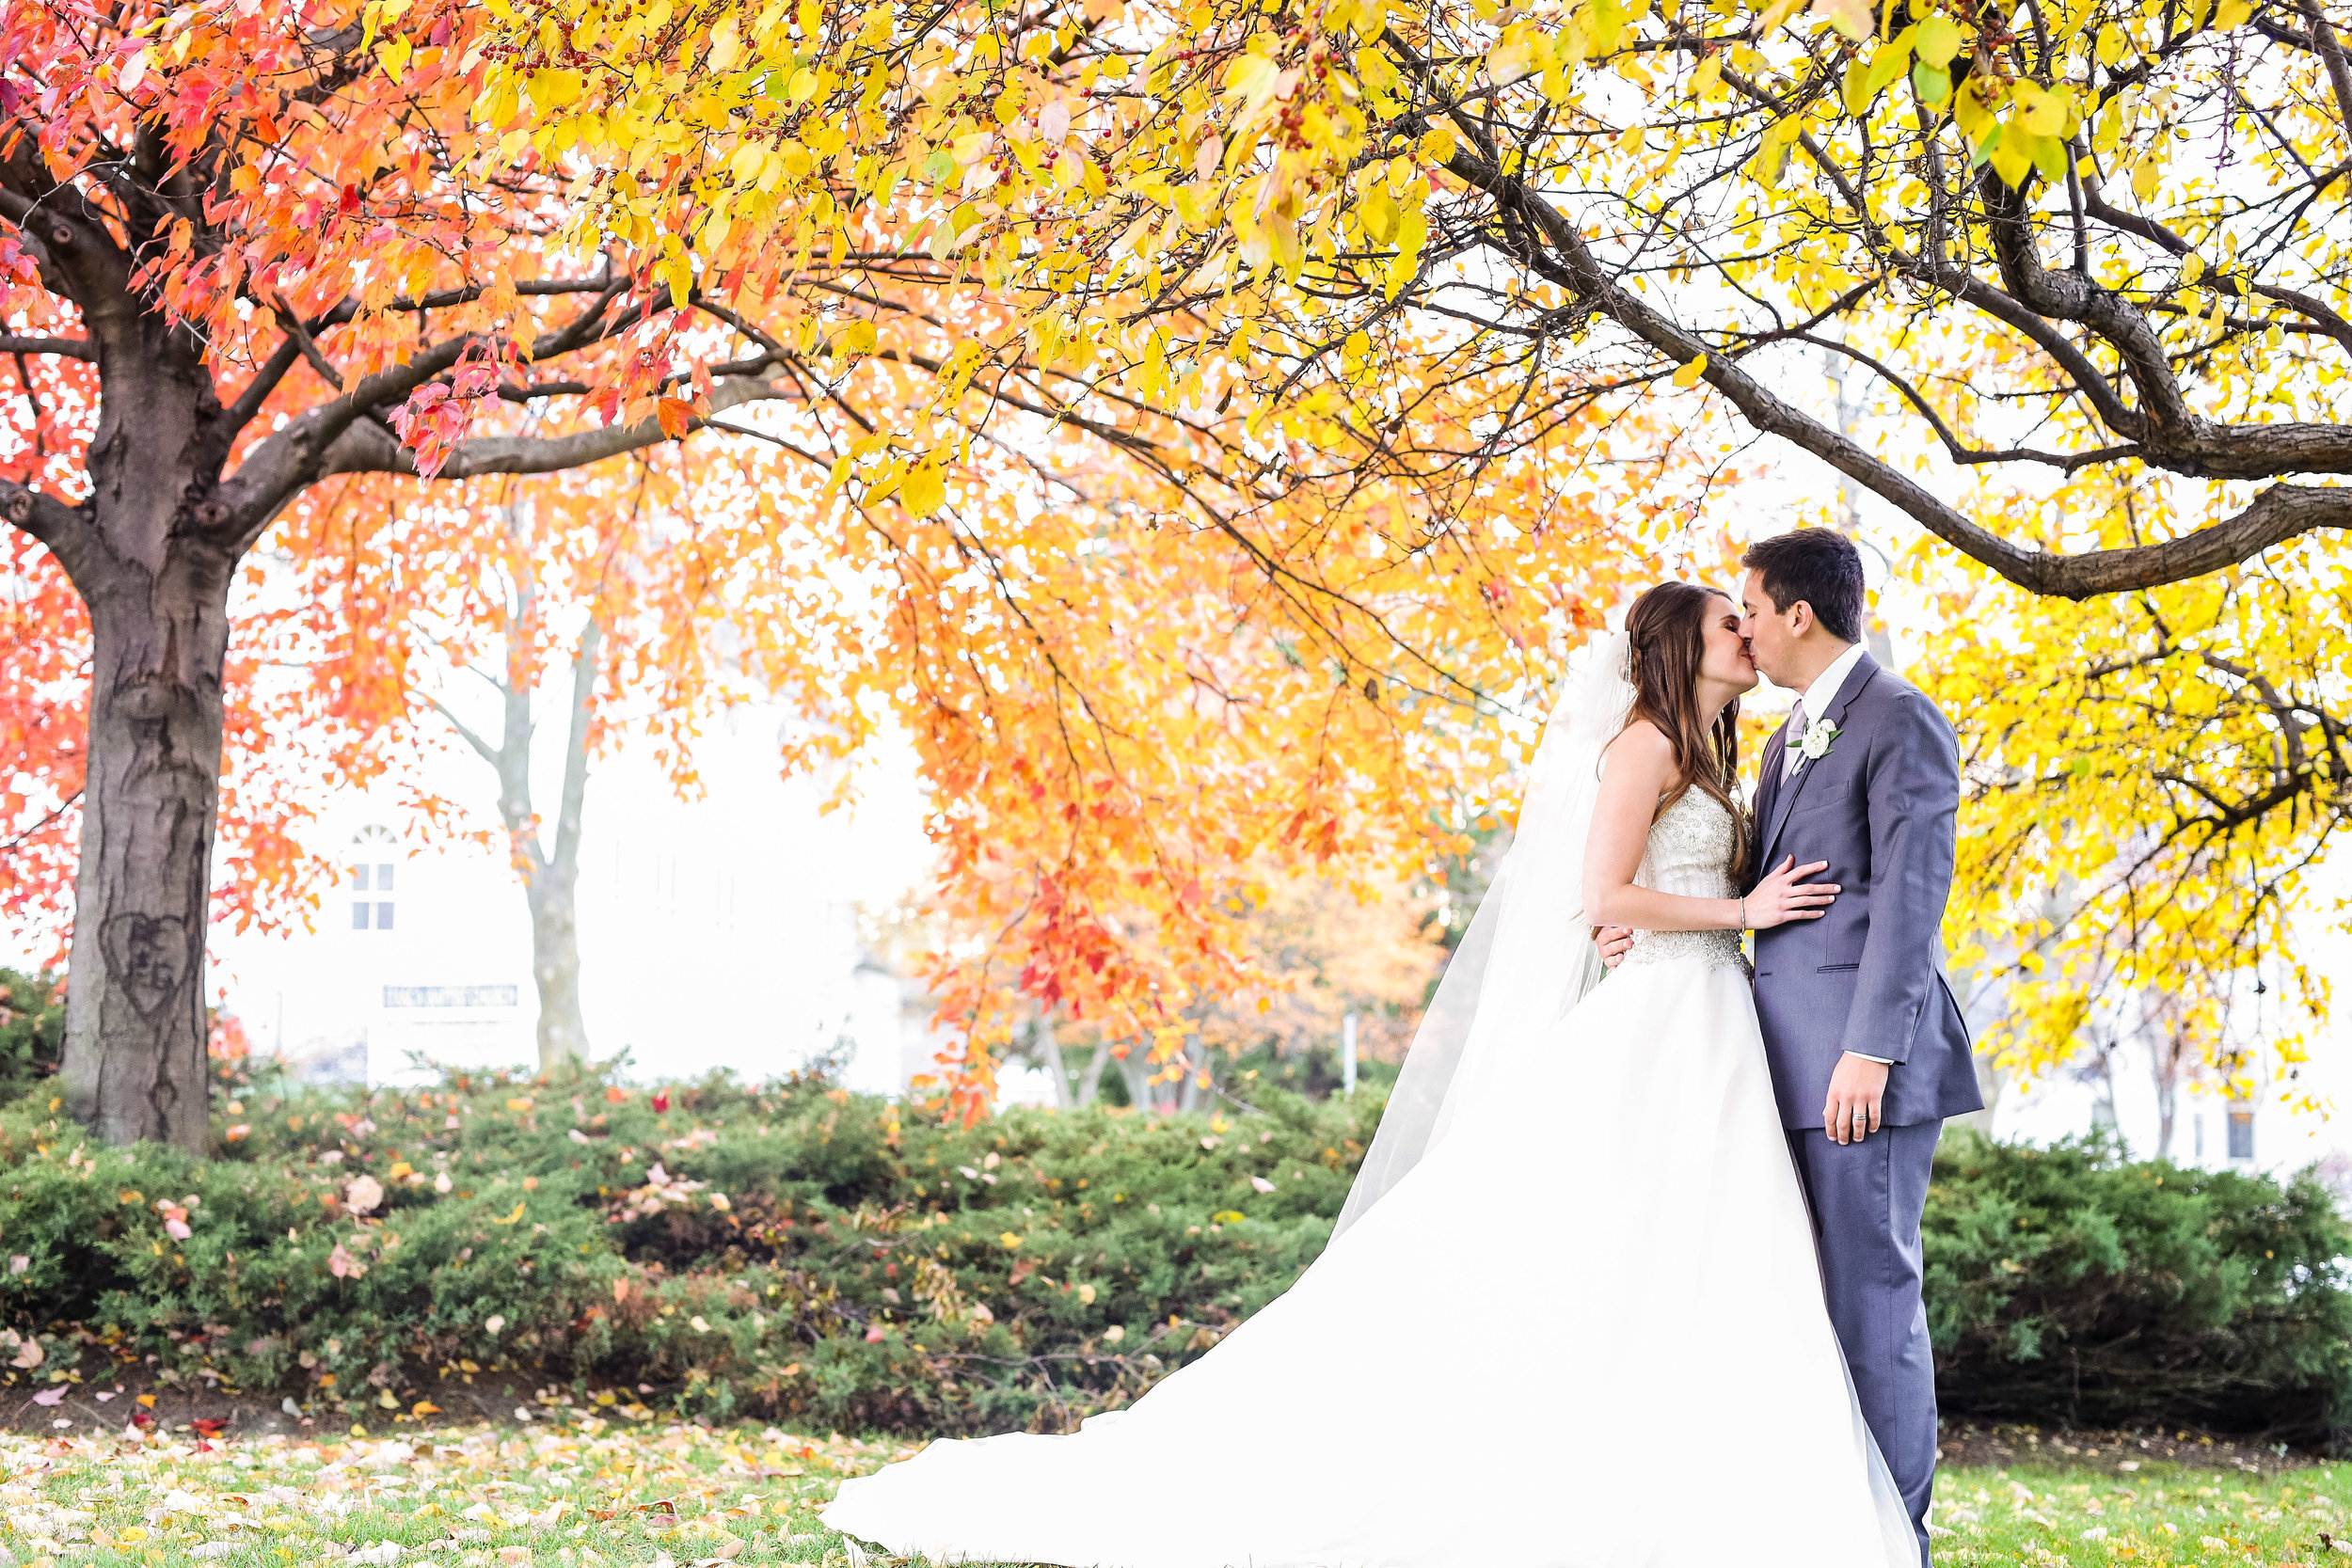 Bride kissing groom under colorful tree